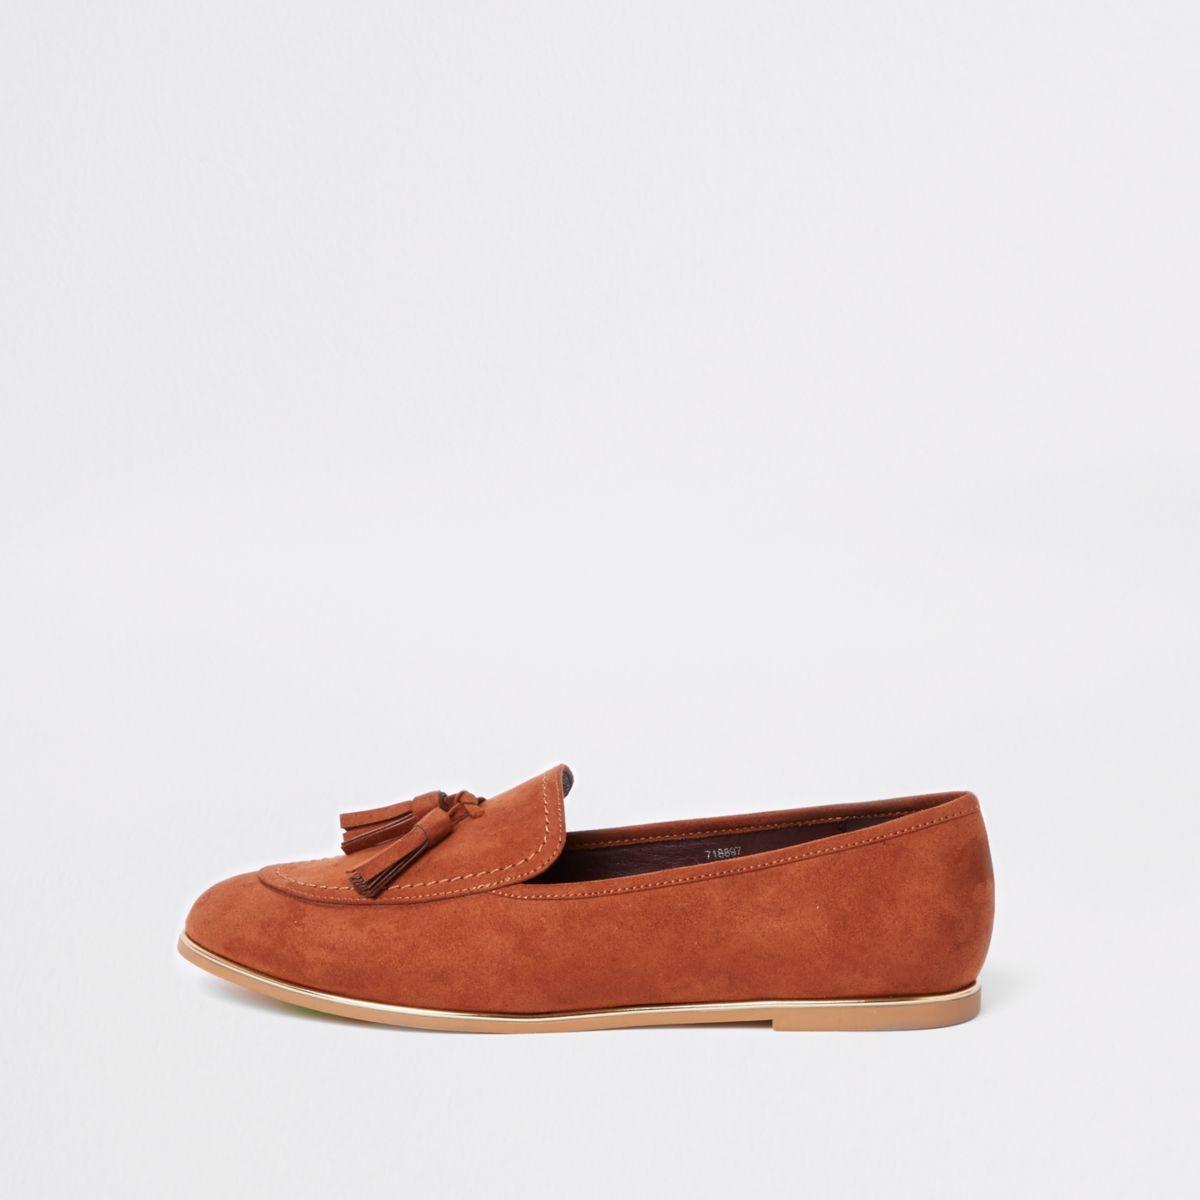 Beige loafers met goudkleurige rand en kwastjes